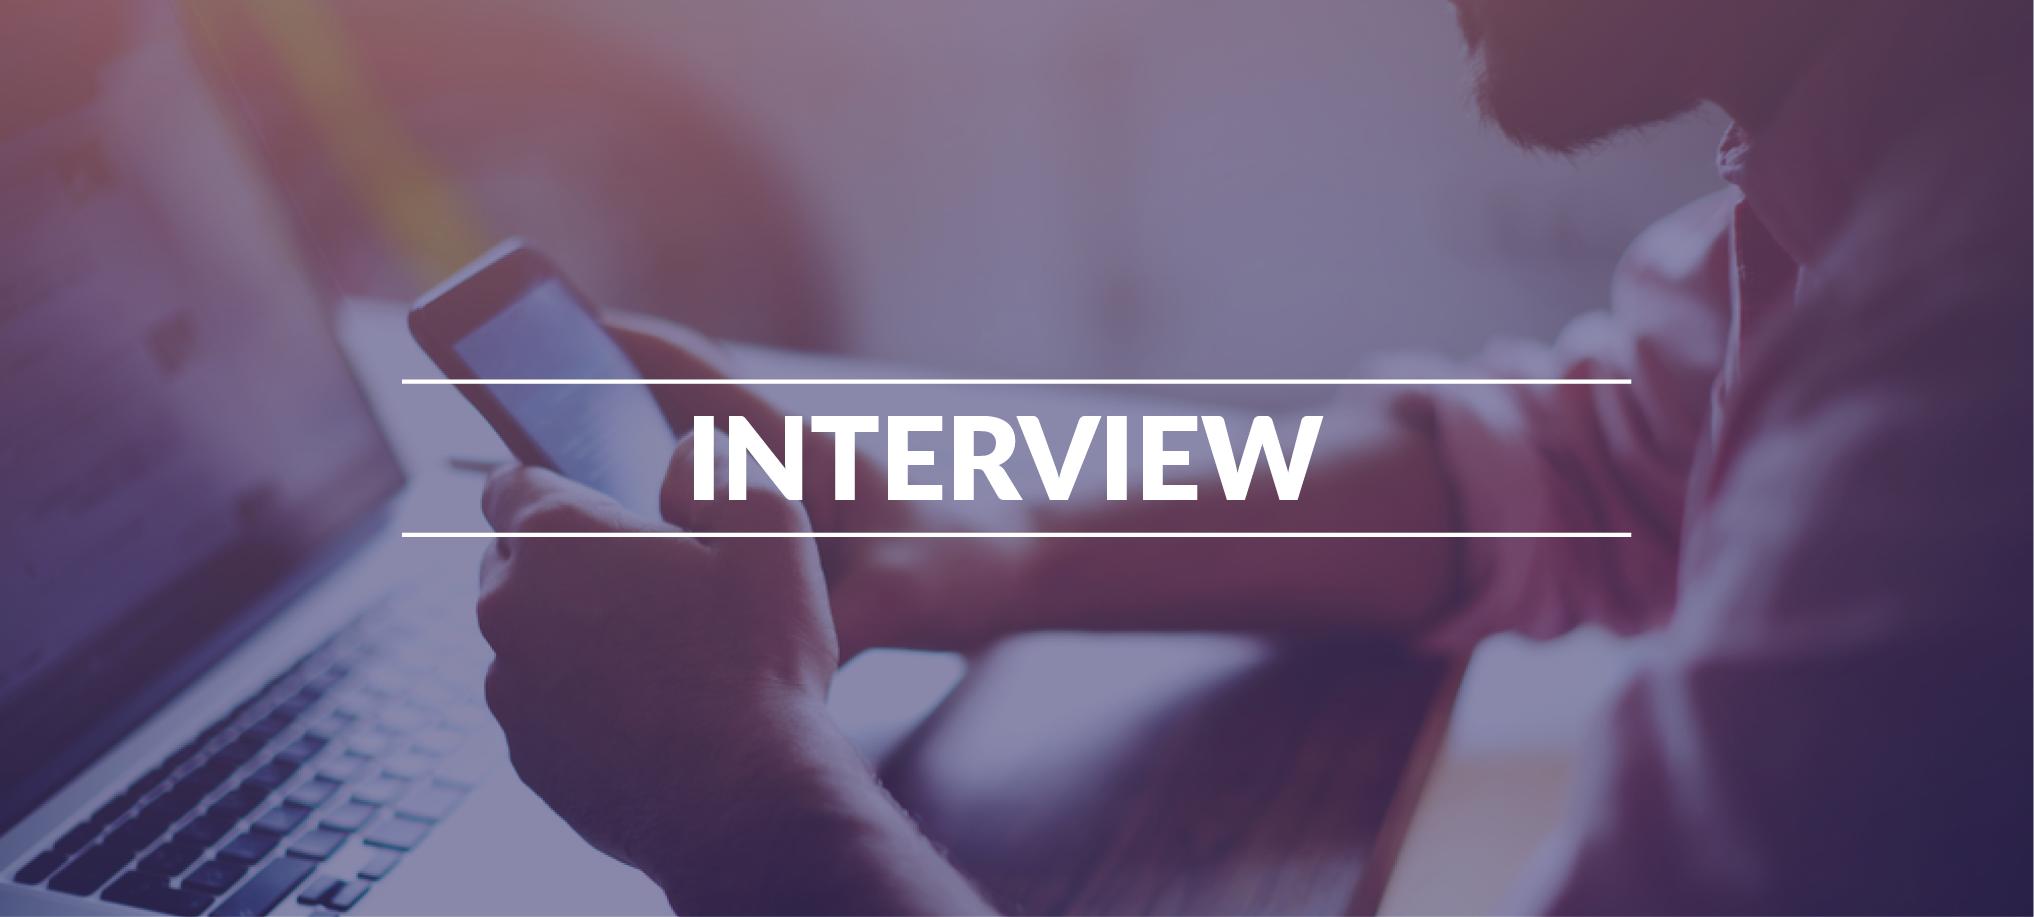 BANNER_INTERVIEW_SELLER_VT_2_BLOG